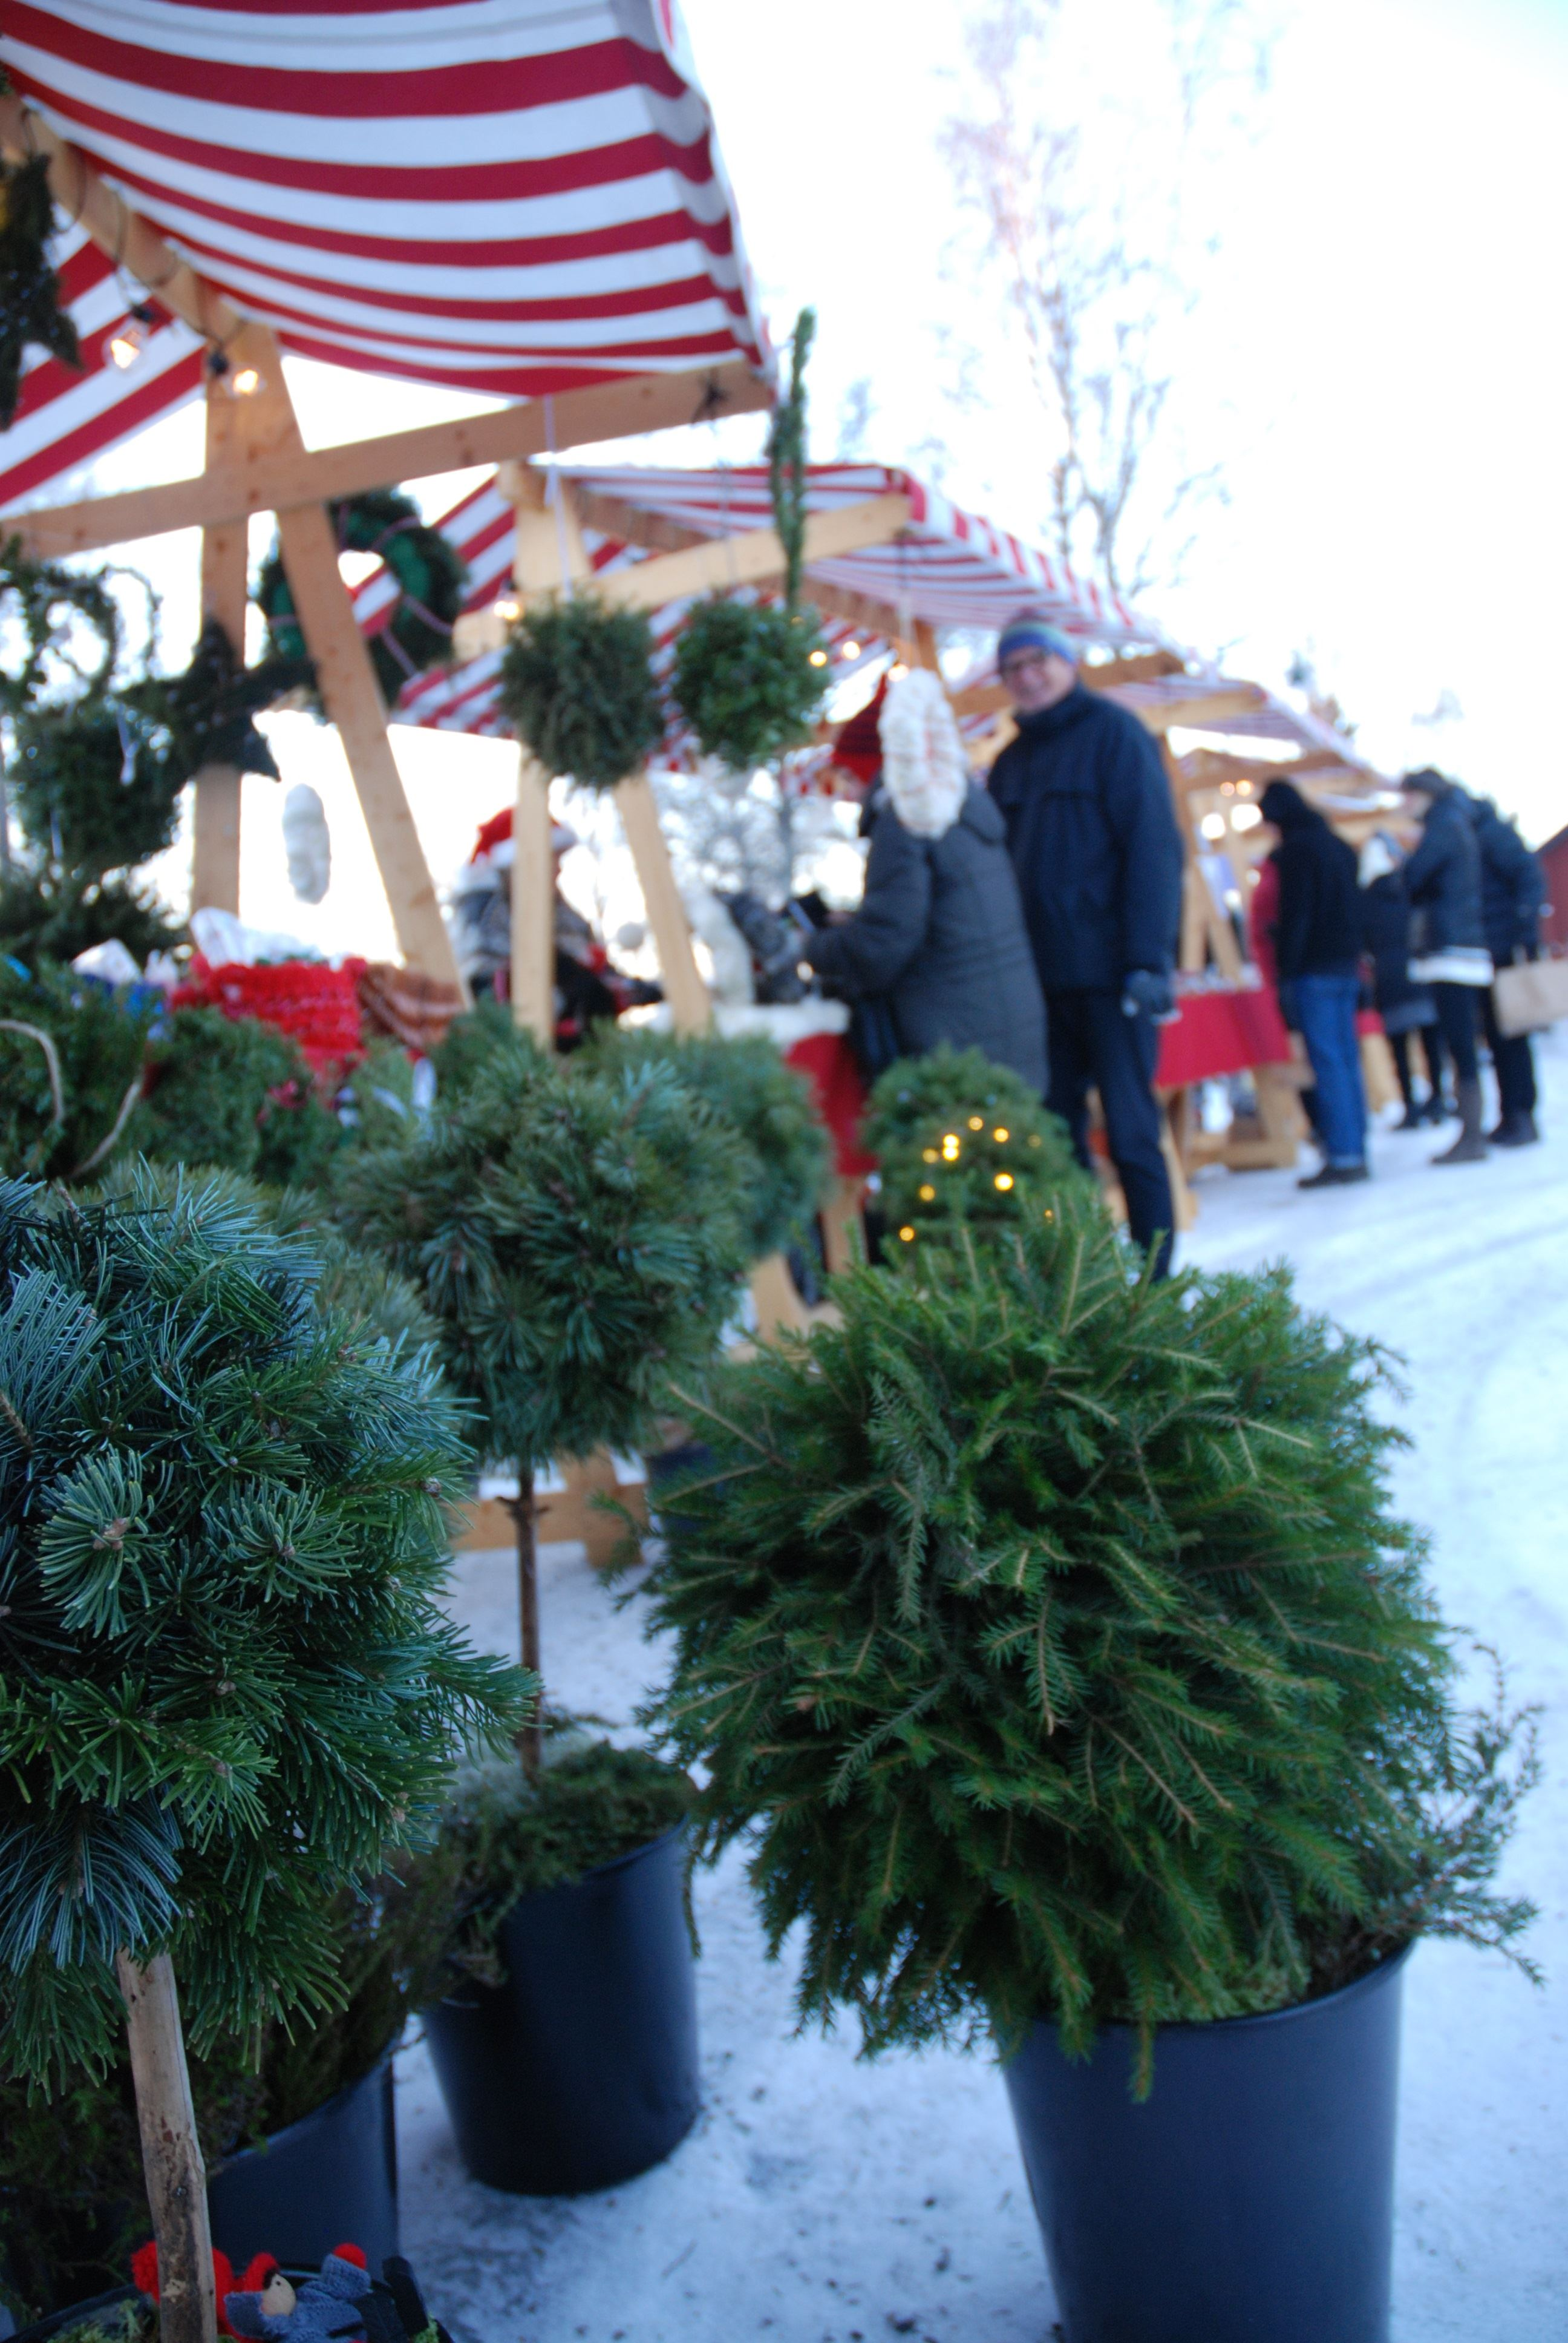 Christmas in Strömbäck